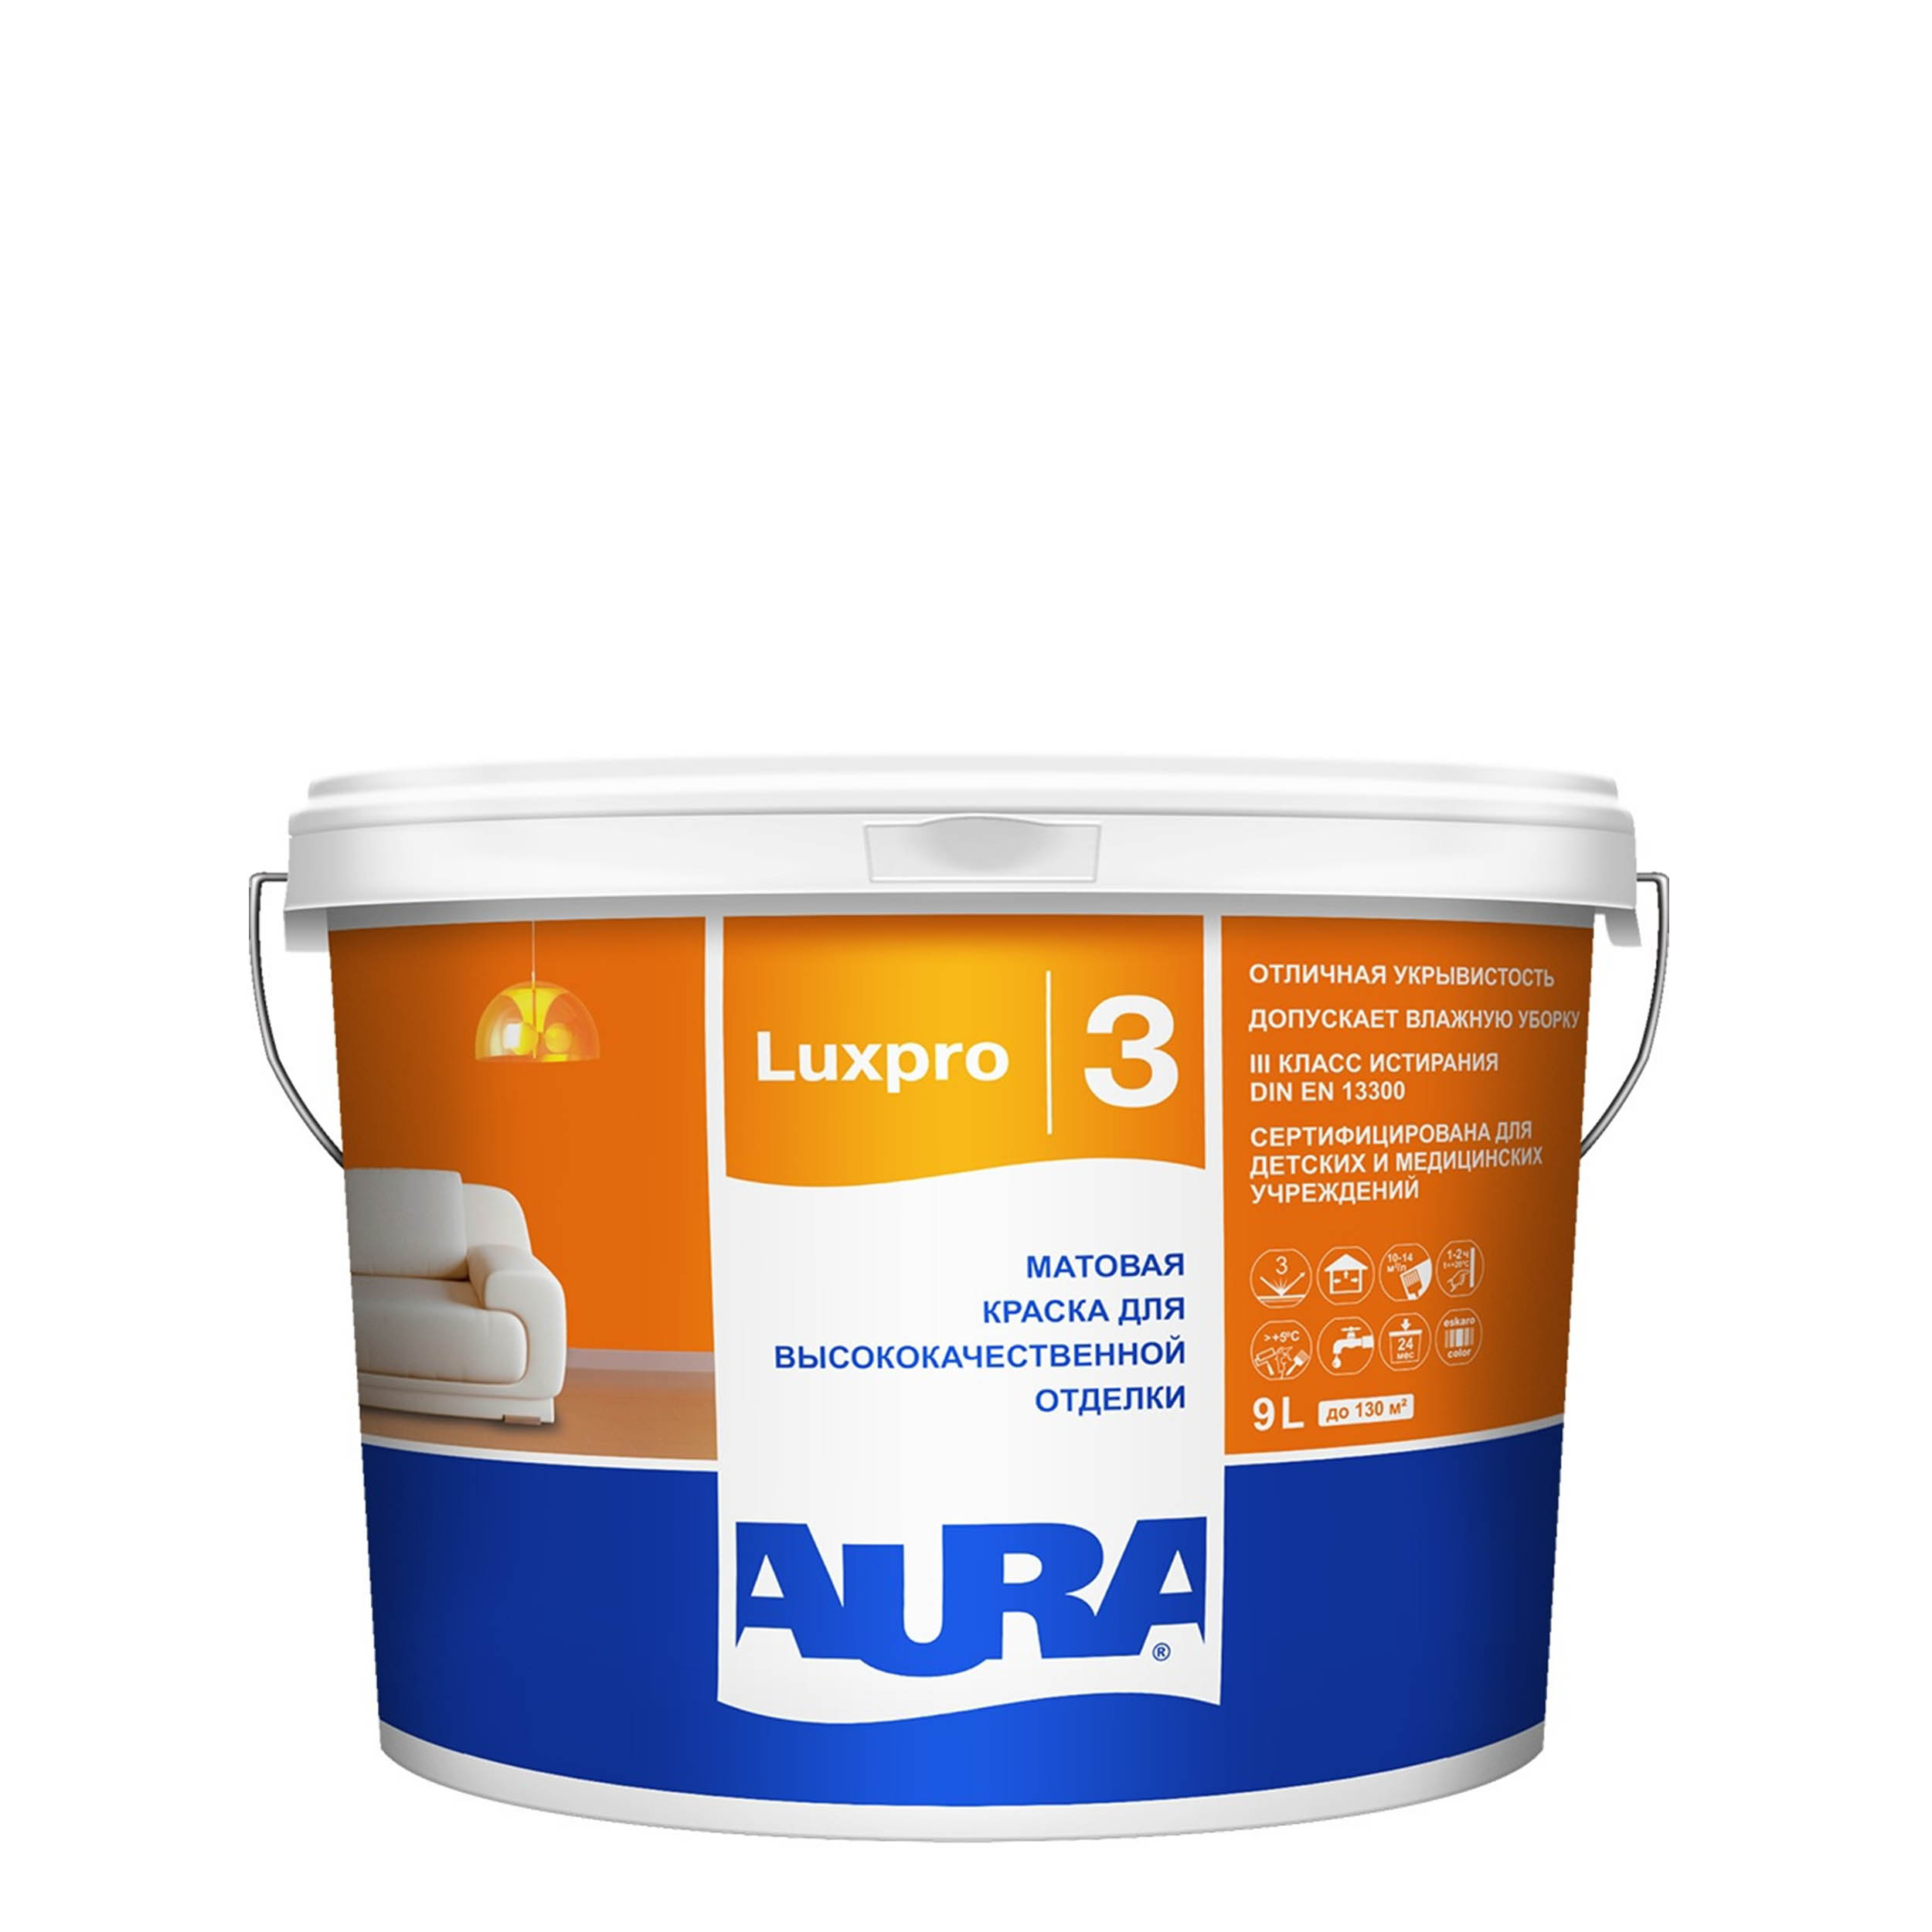 Фото 4 - Краска интерьерная, Aura LuxPRO 3, RAL 1017, 11 кг.